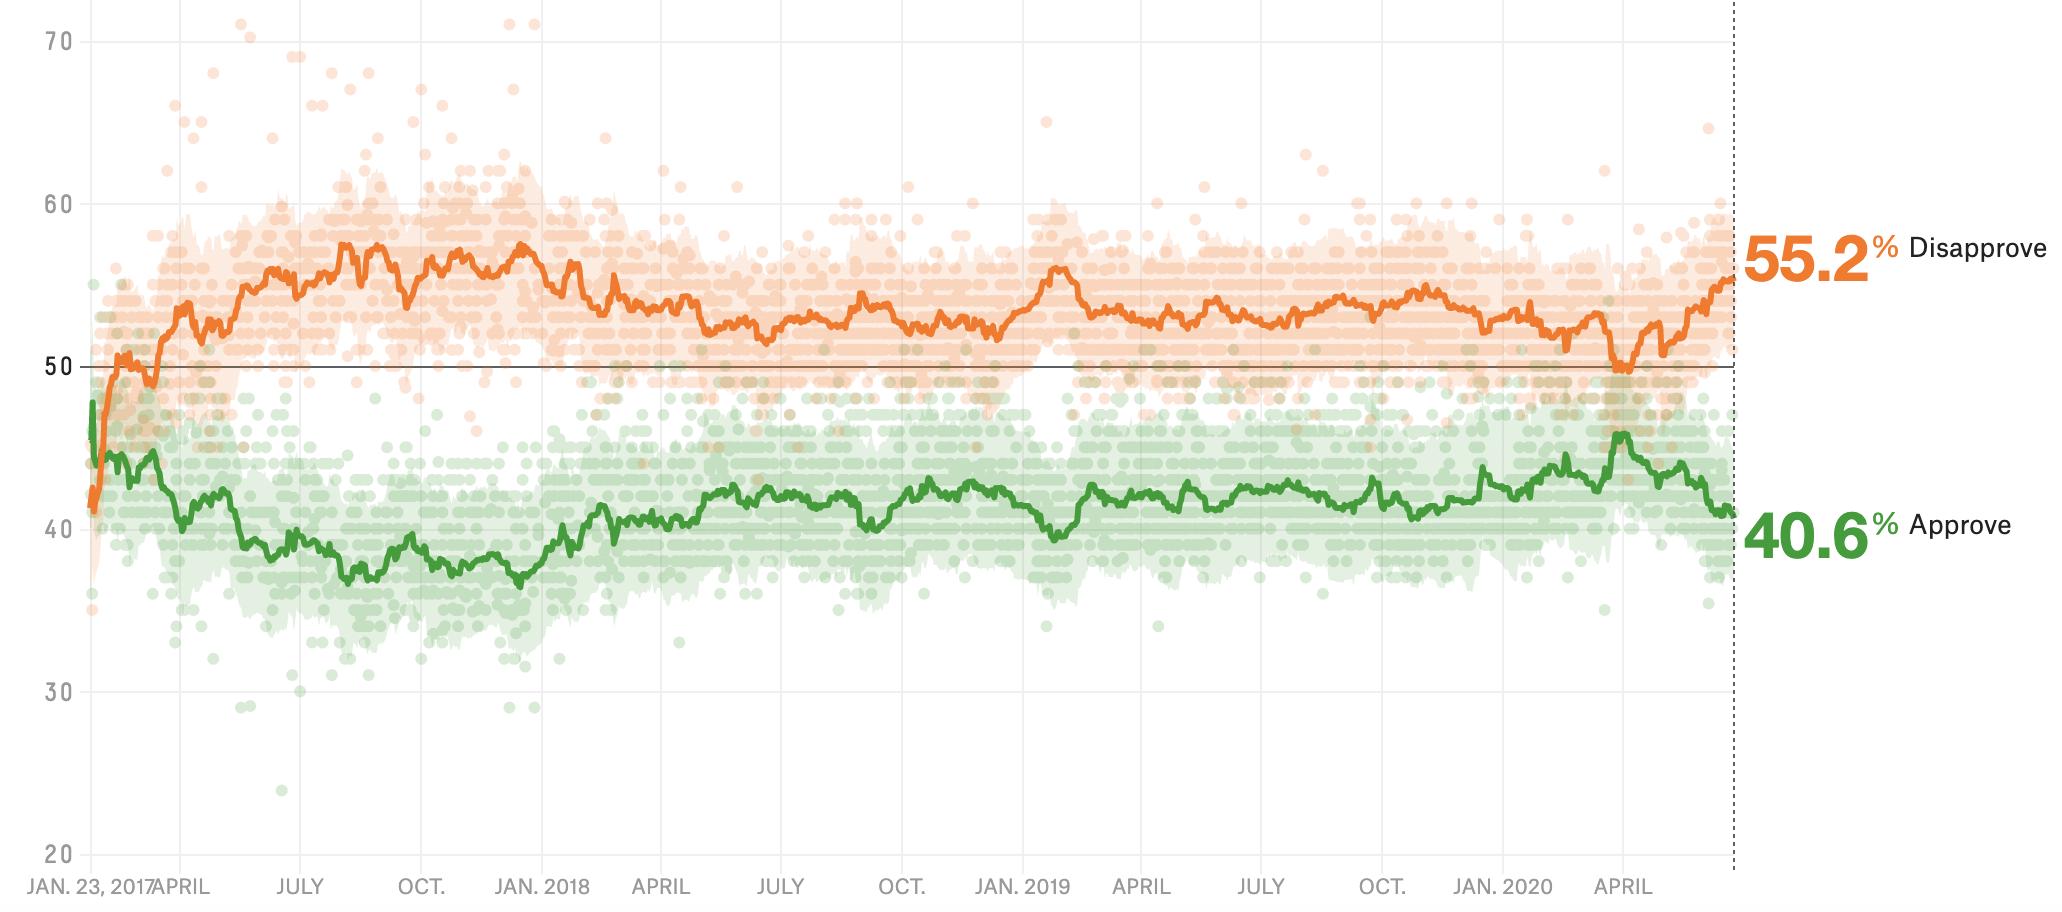 The Latest Senate Polls Show Some Good News For Democrats 1